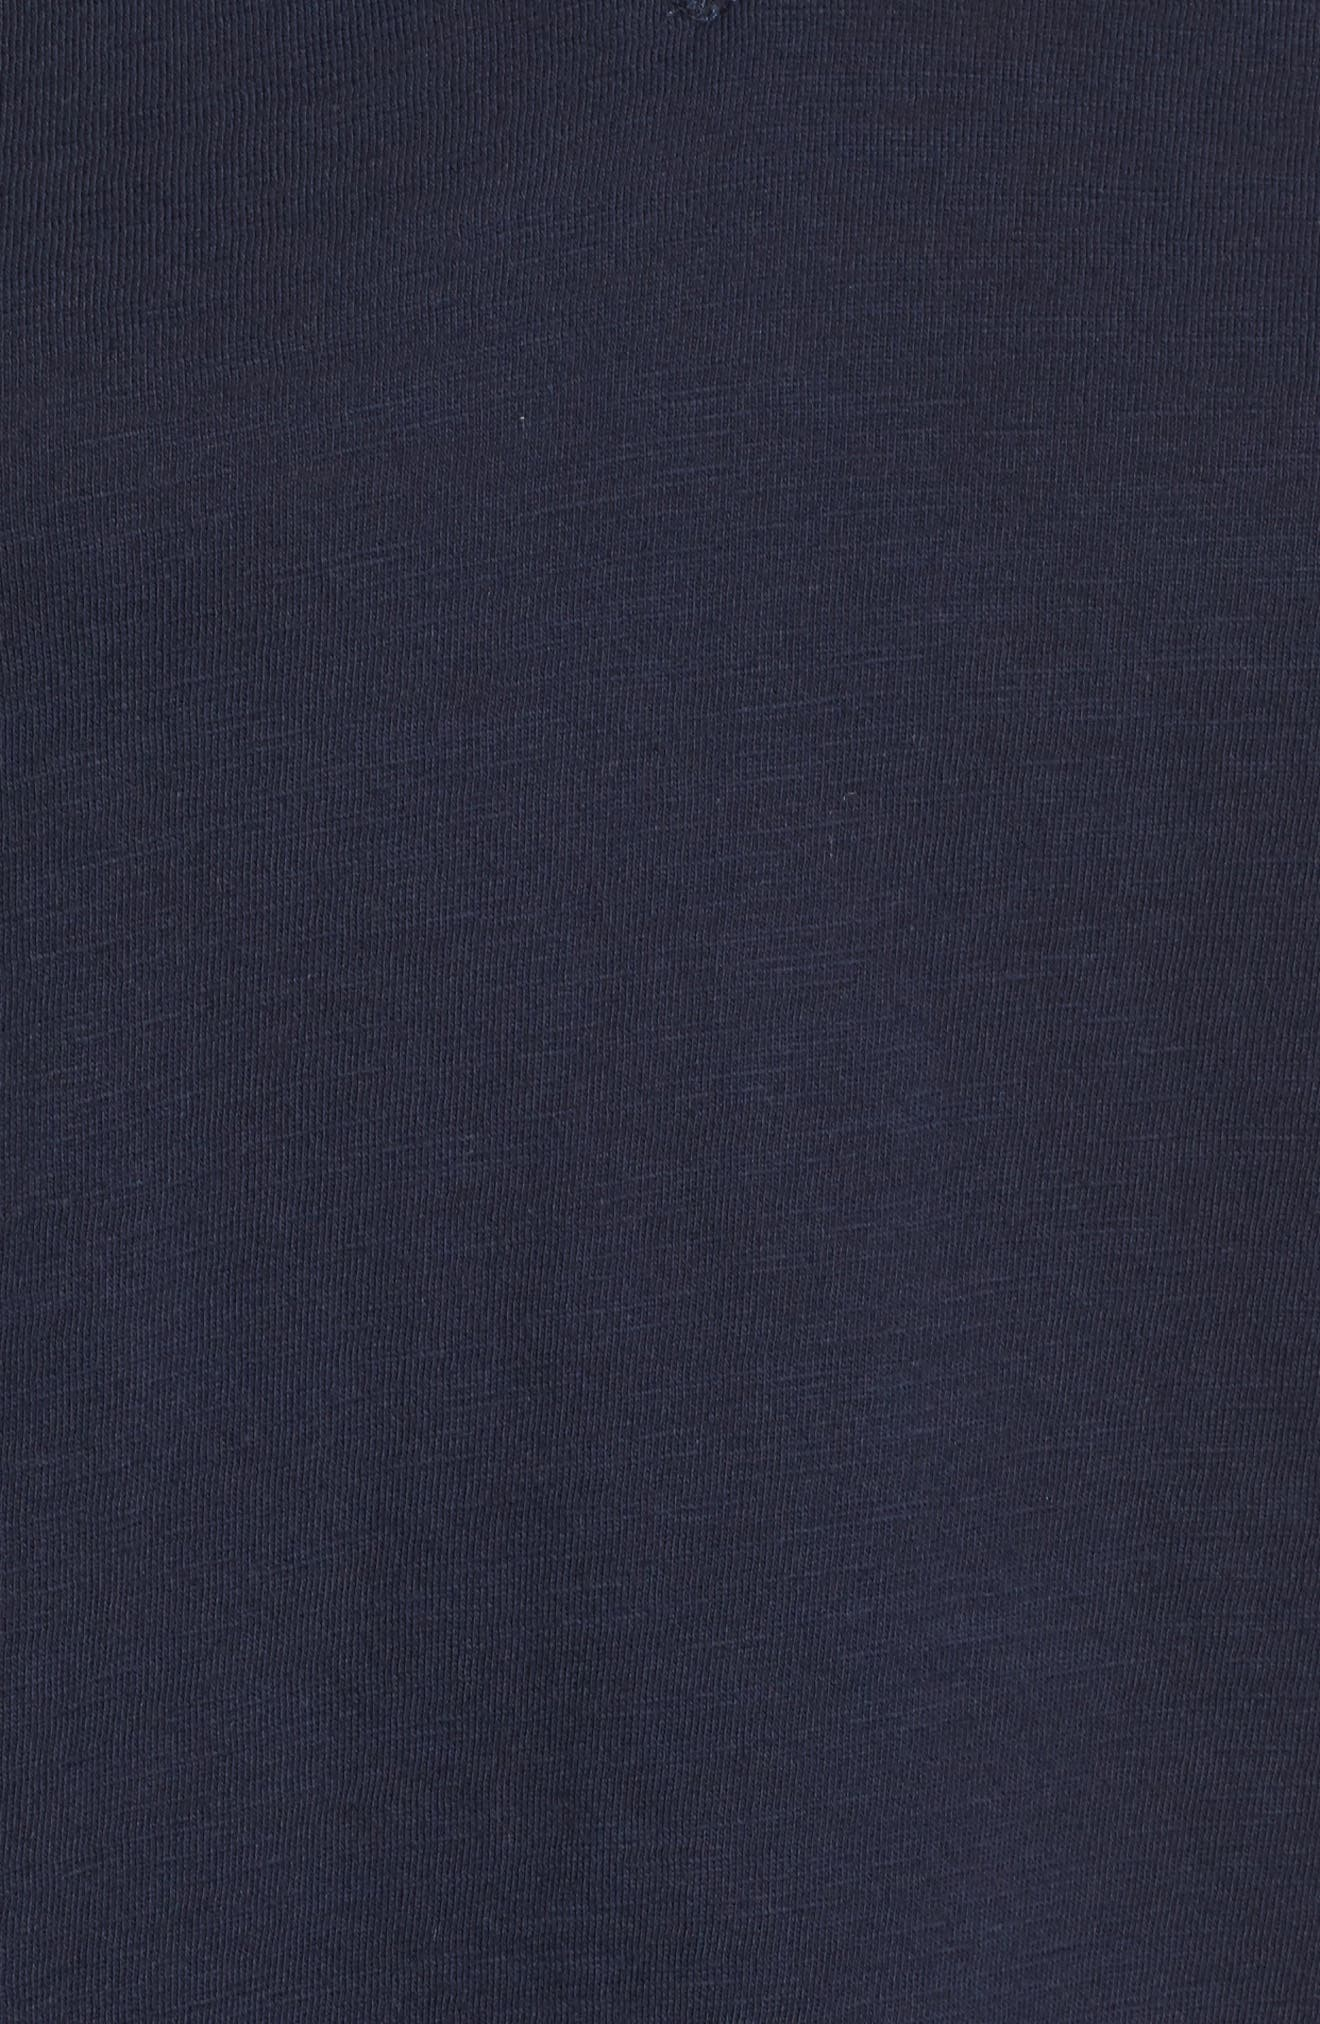 Organic Cotton V-Neck Tee,                             Alternate thumbnail 5, color,                             Midnight